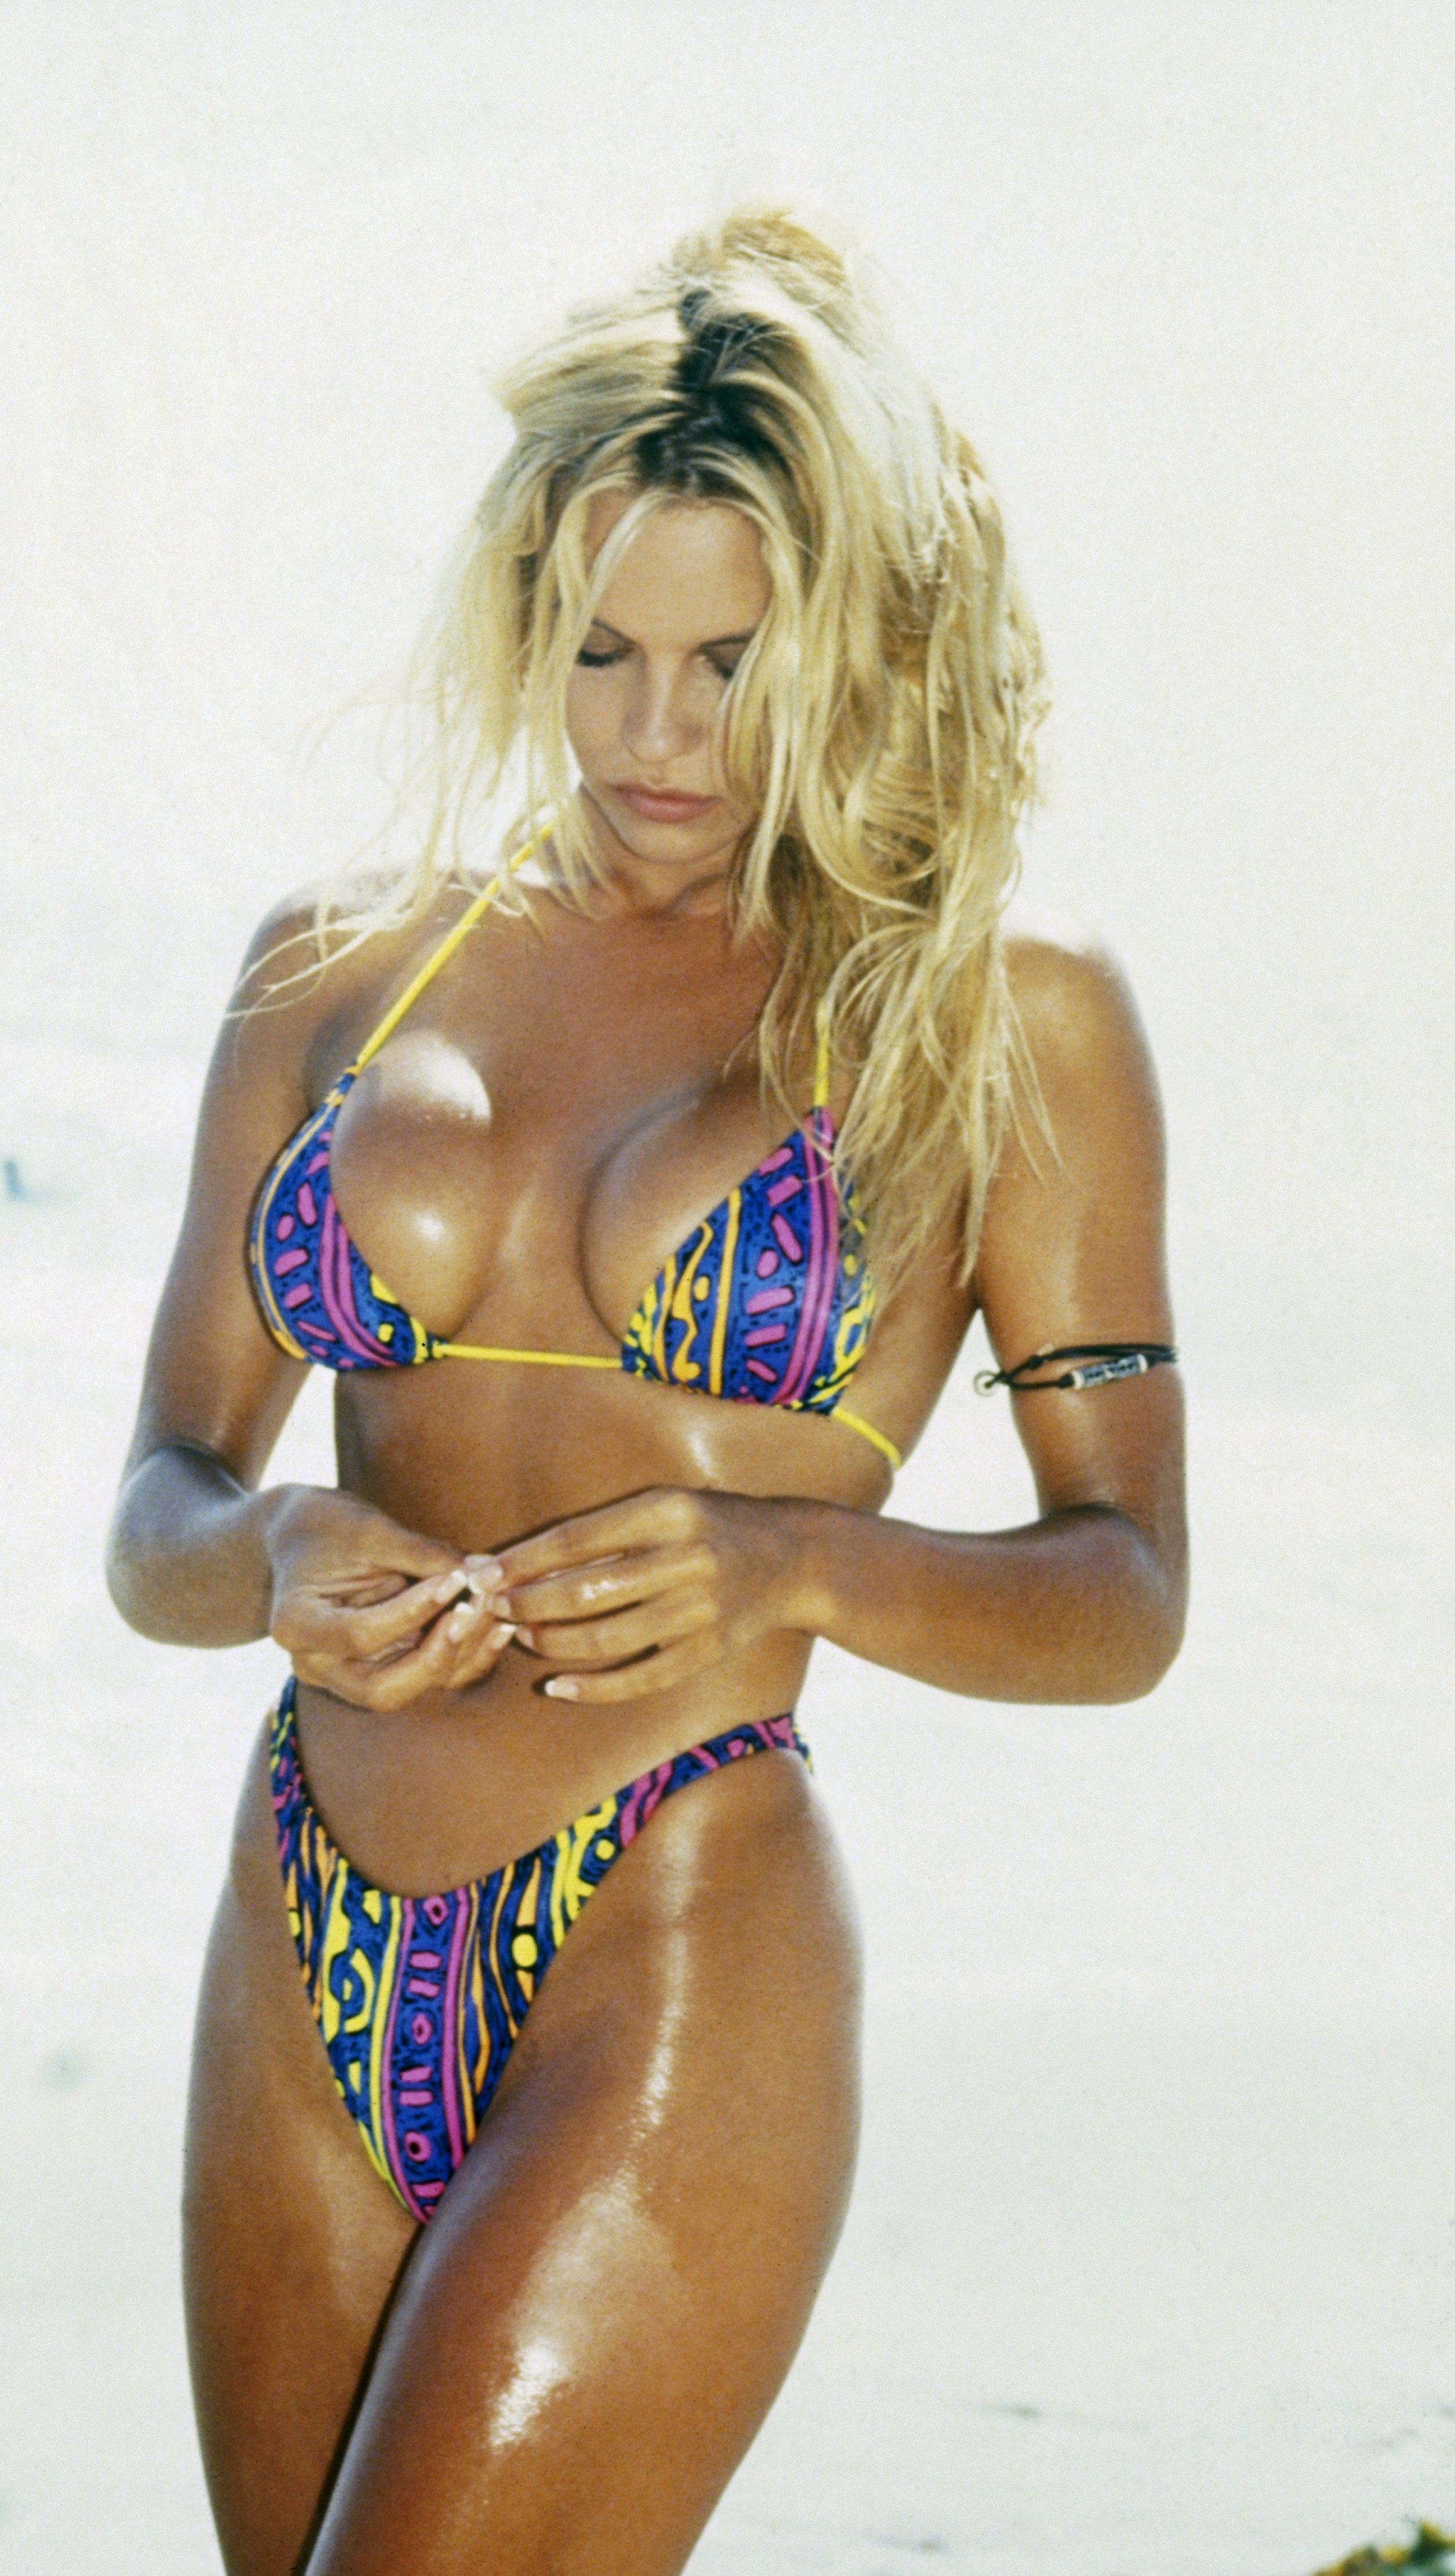 Baywatch-era Pamela Anderson